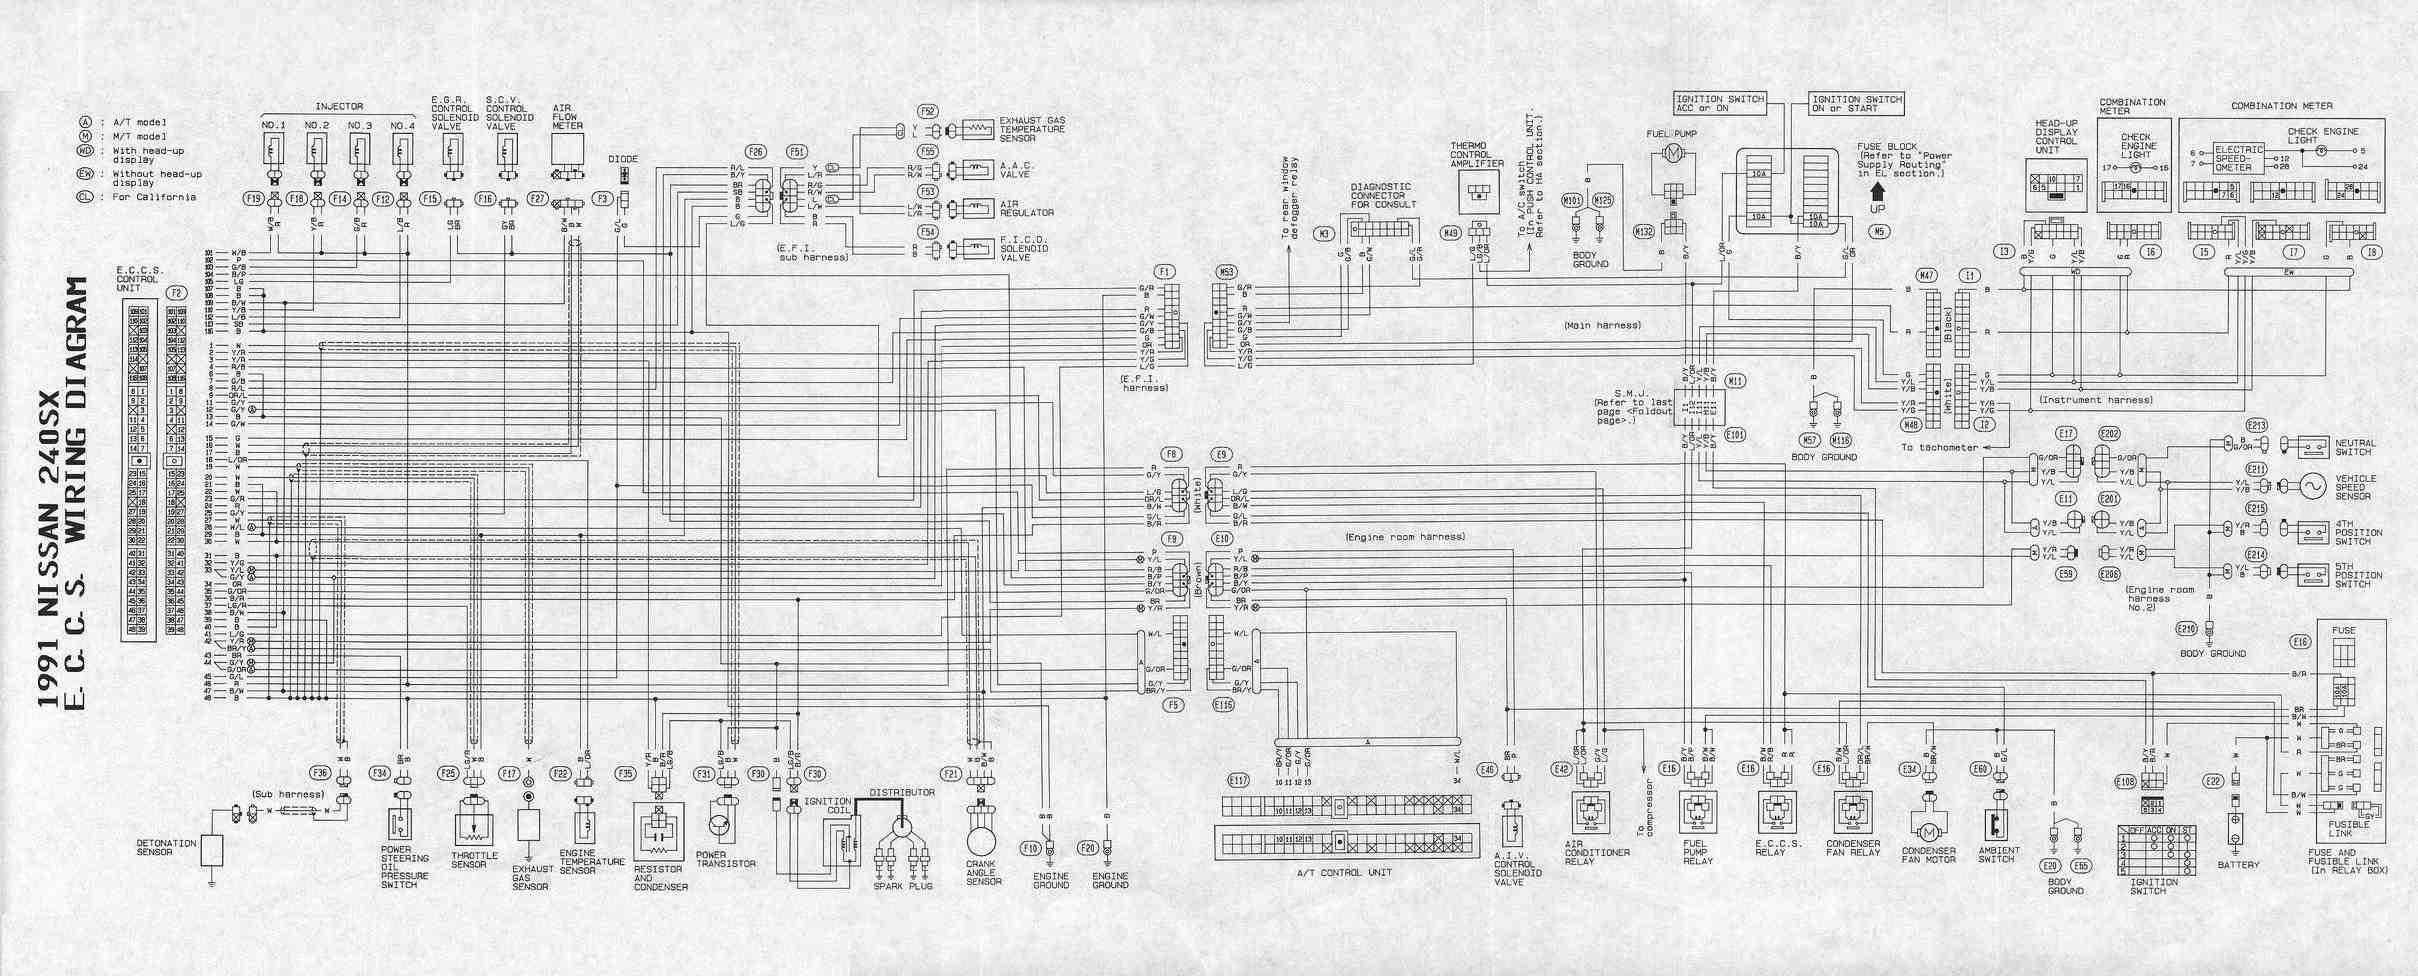 captivating nissan micra k12 wiring diagram pdf photos best image nissan micra 2003 fuse box diagram [ 2418 x 976 Pixel ]